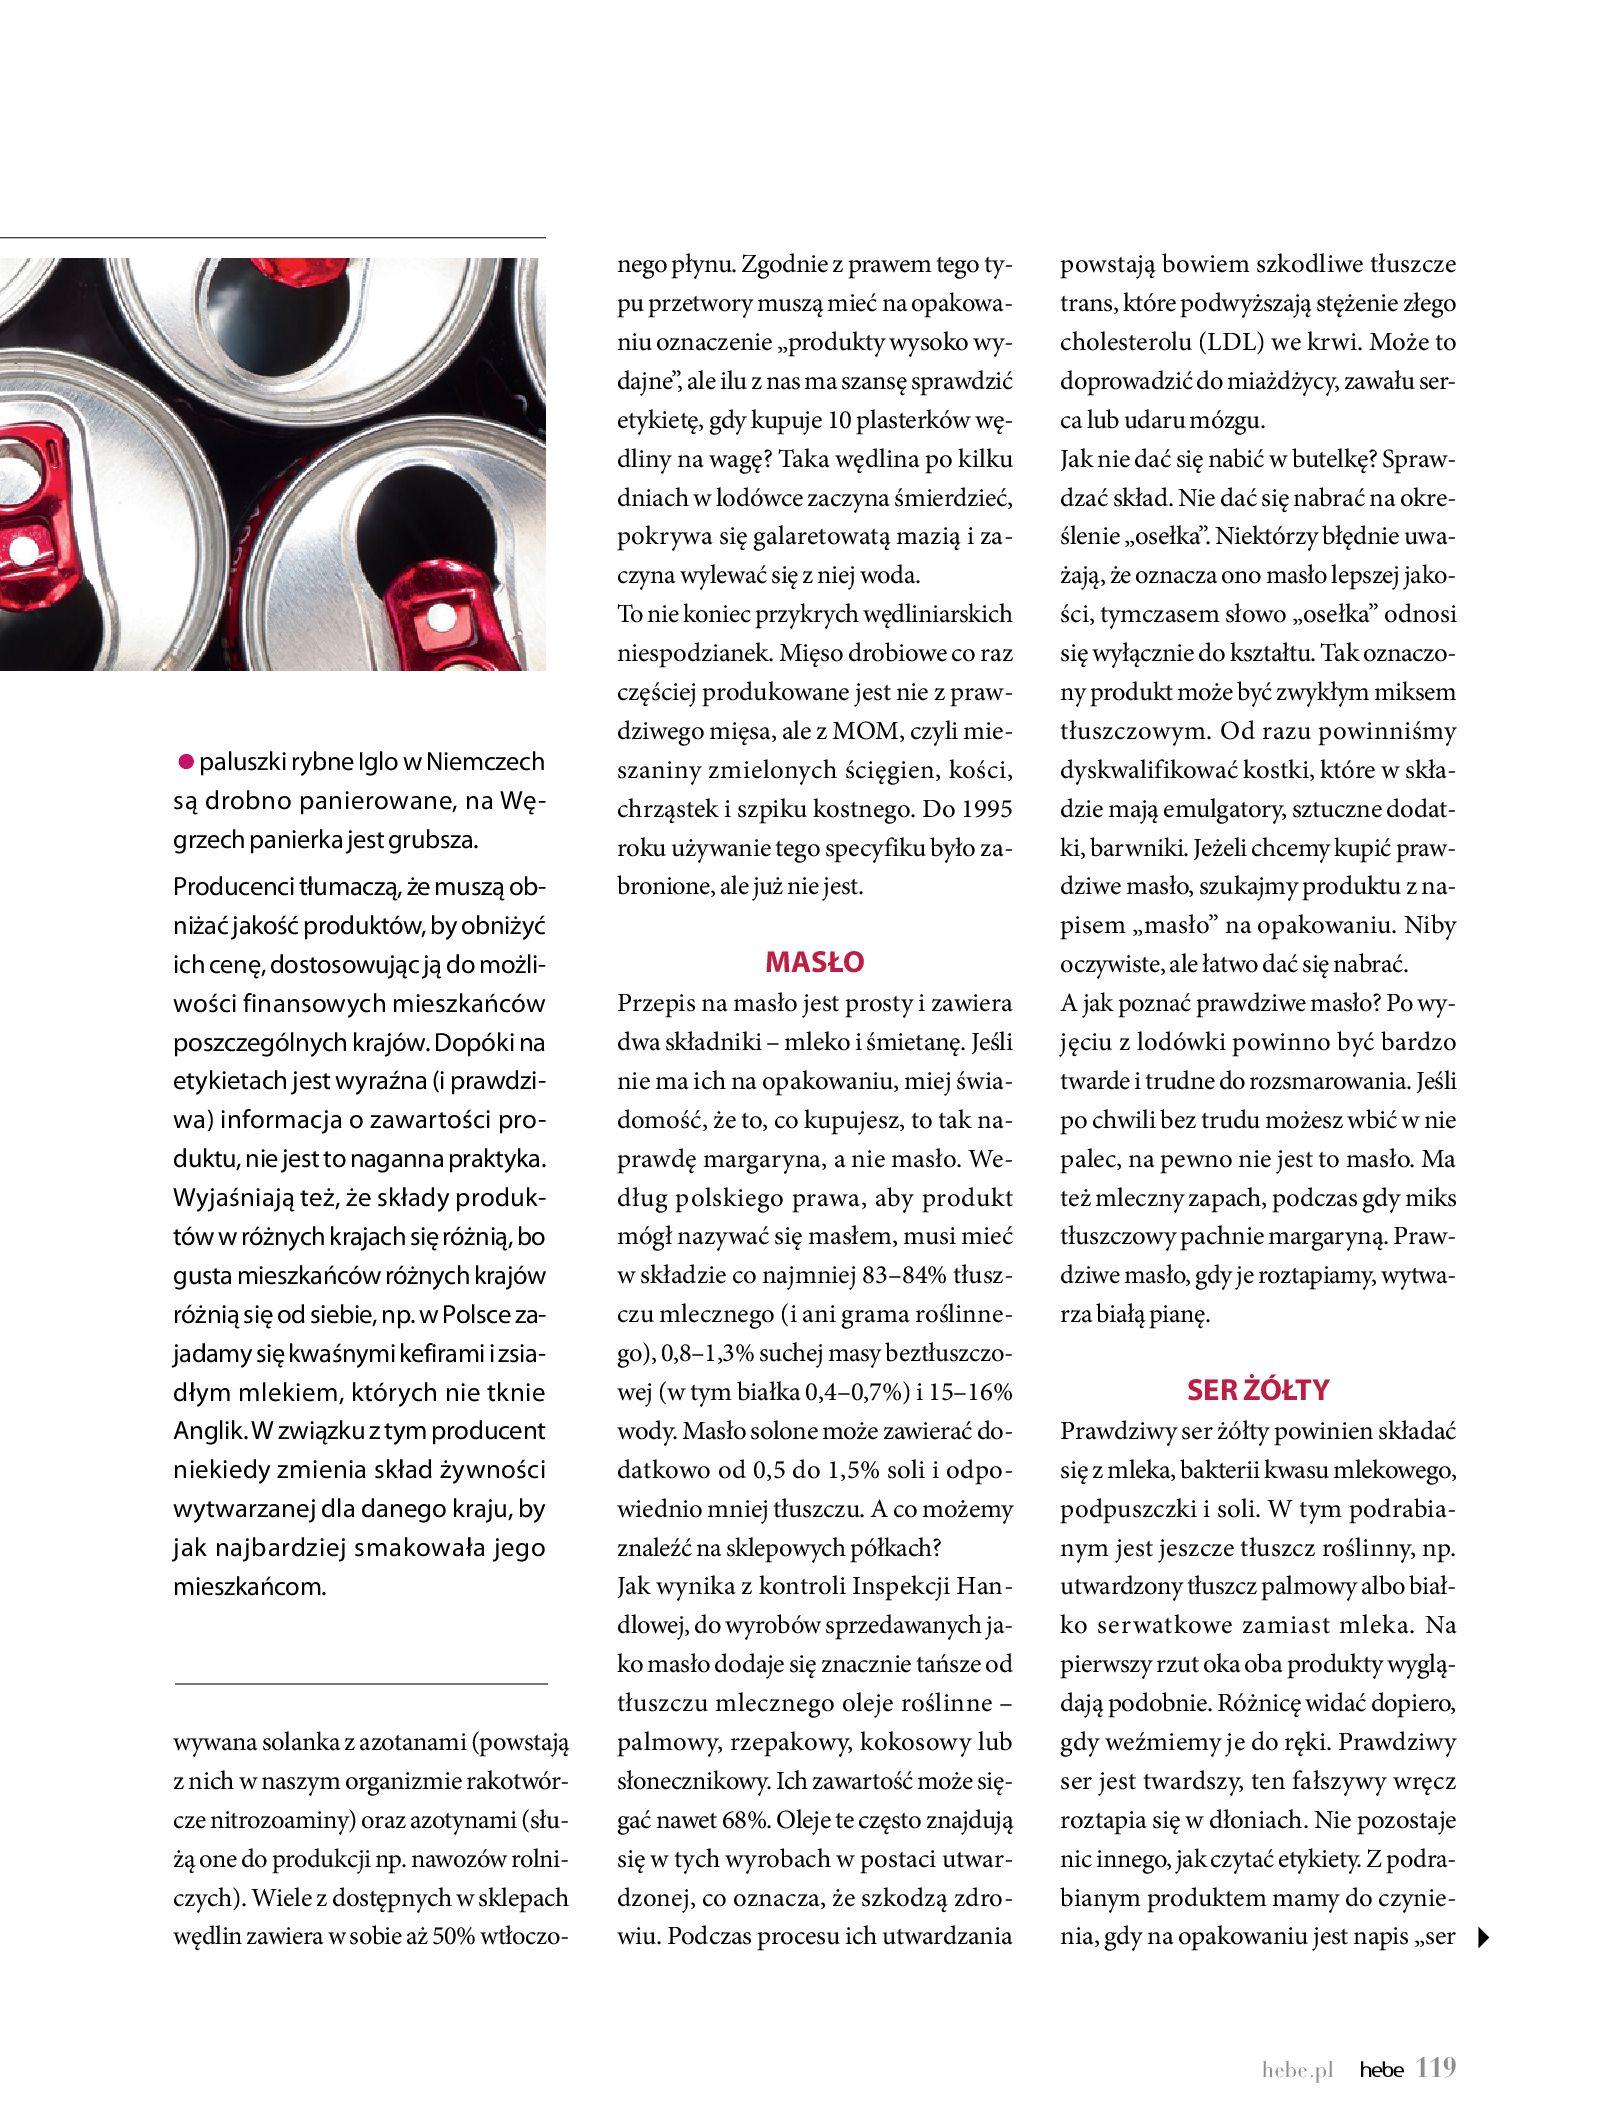 Gazetka hebe: Magazyn Hebe - Trendy na lato 2021-07-01 page-119